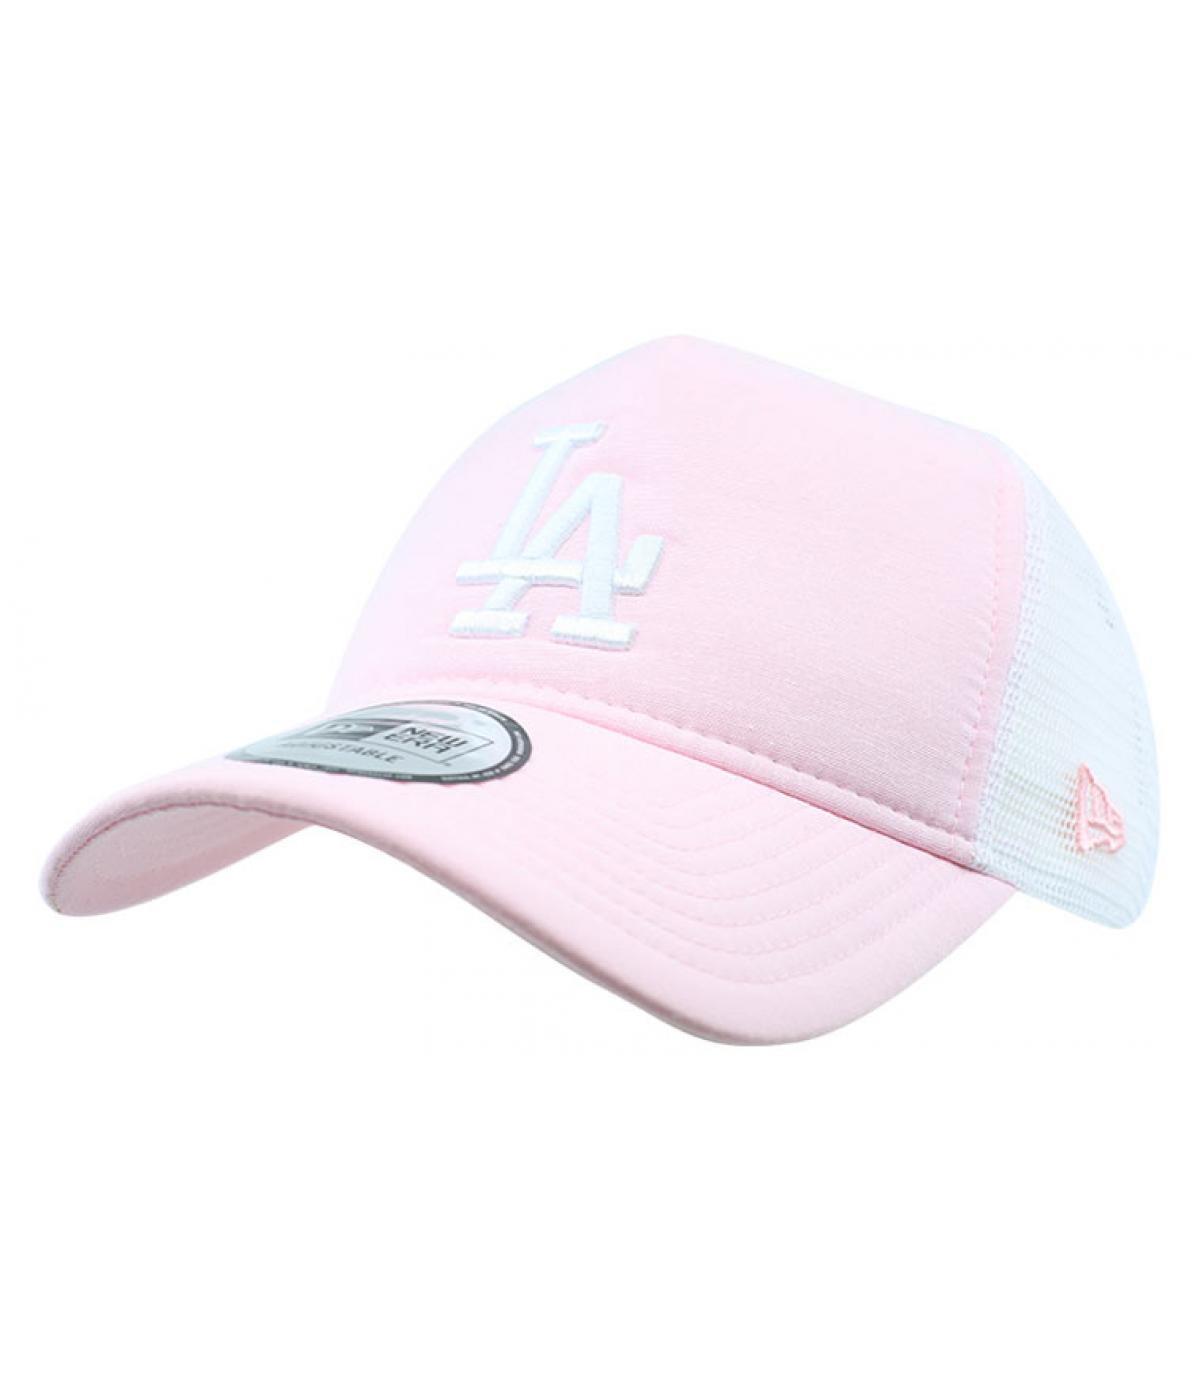 Détails Trucker MLB Oxford LA pink - image 2